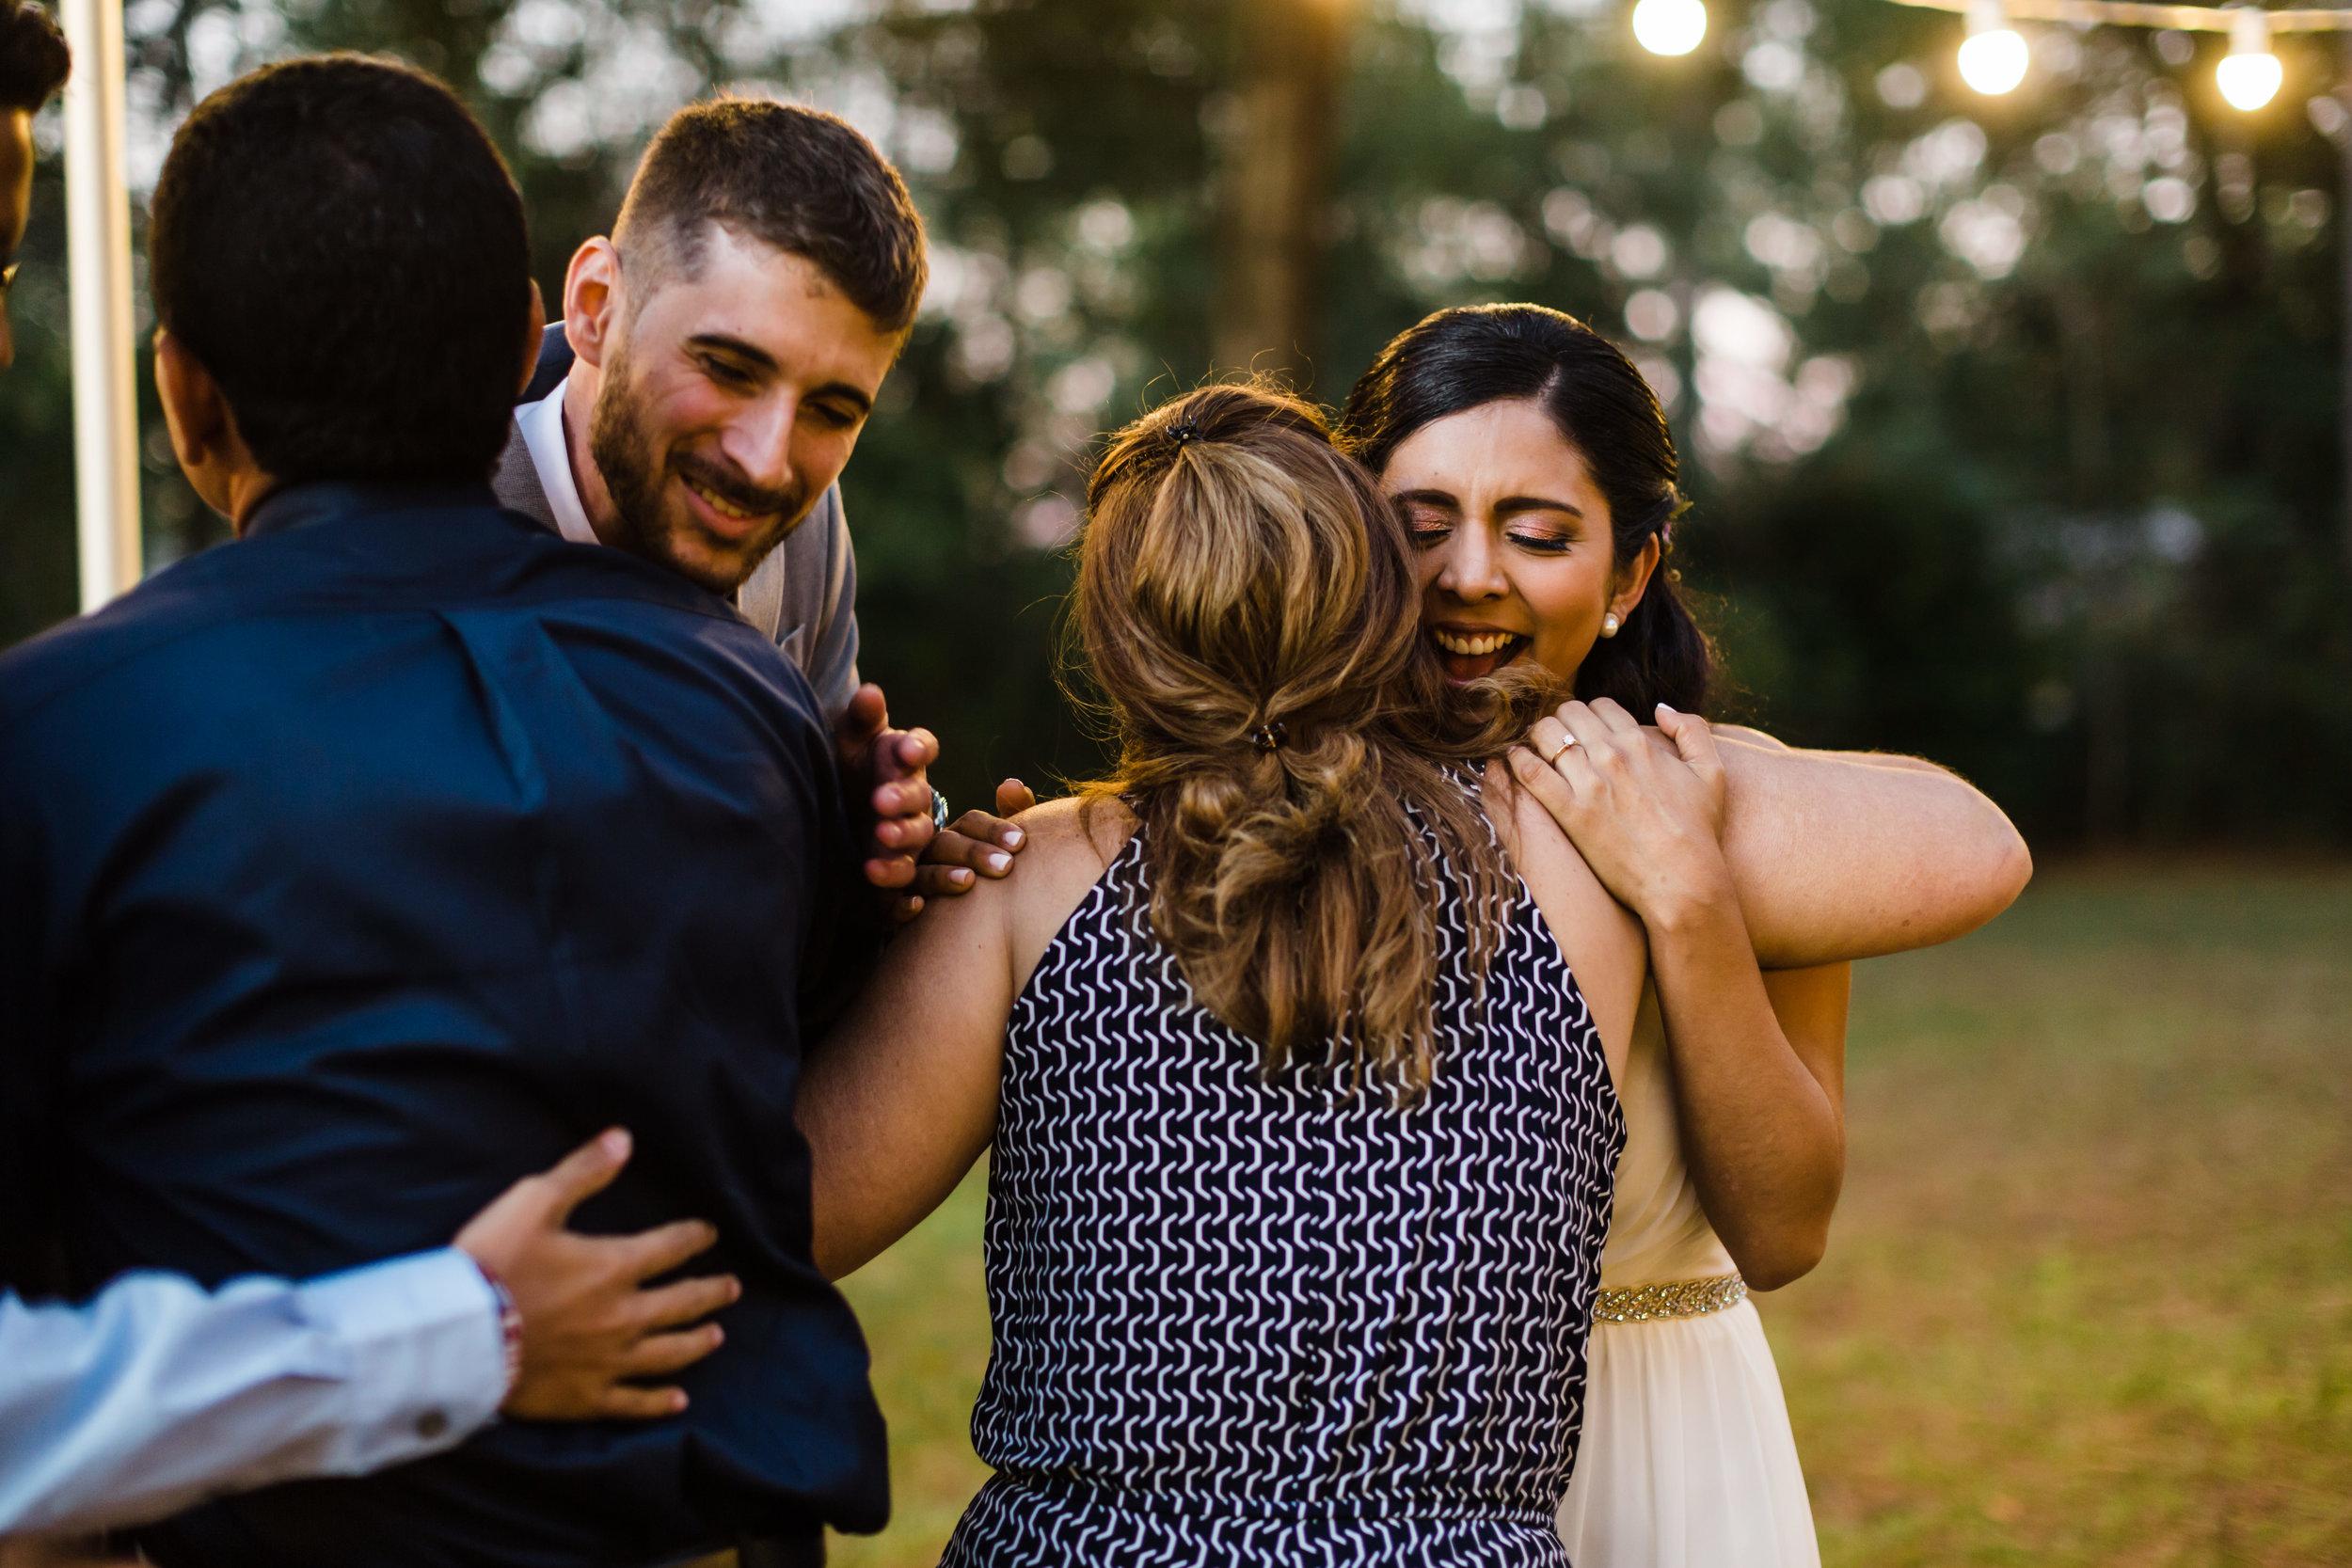 2018.11.03 Jael and Edel Ocala Wedding FINALS (395 of 441).jpg